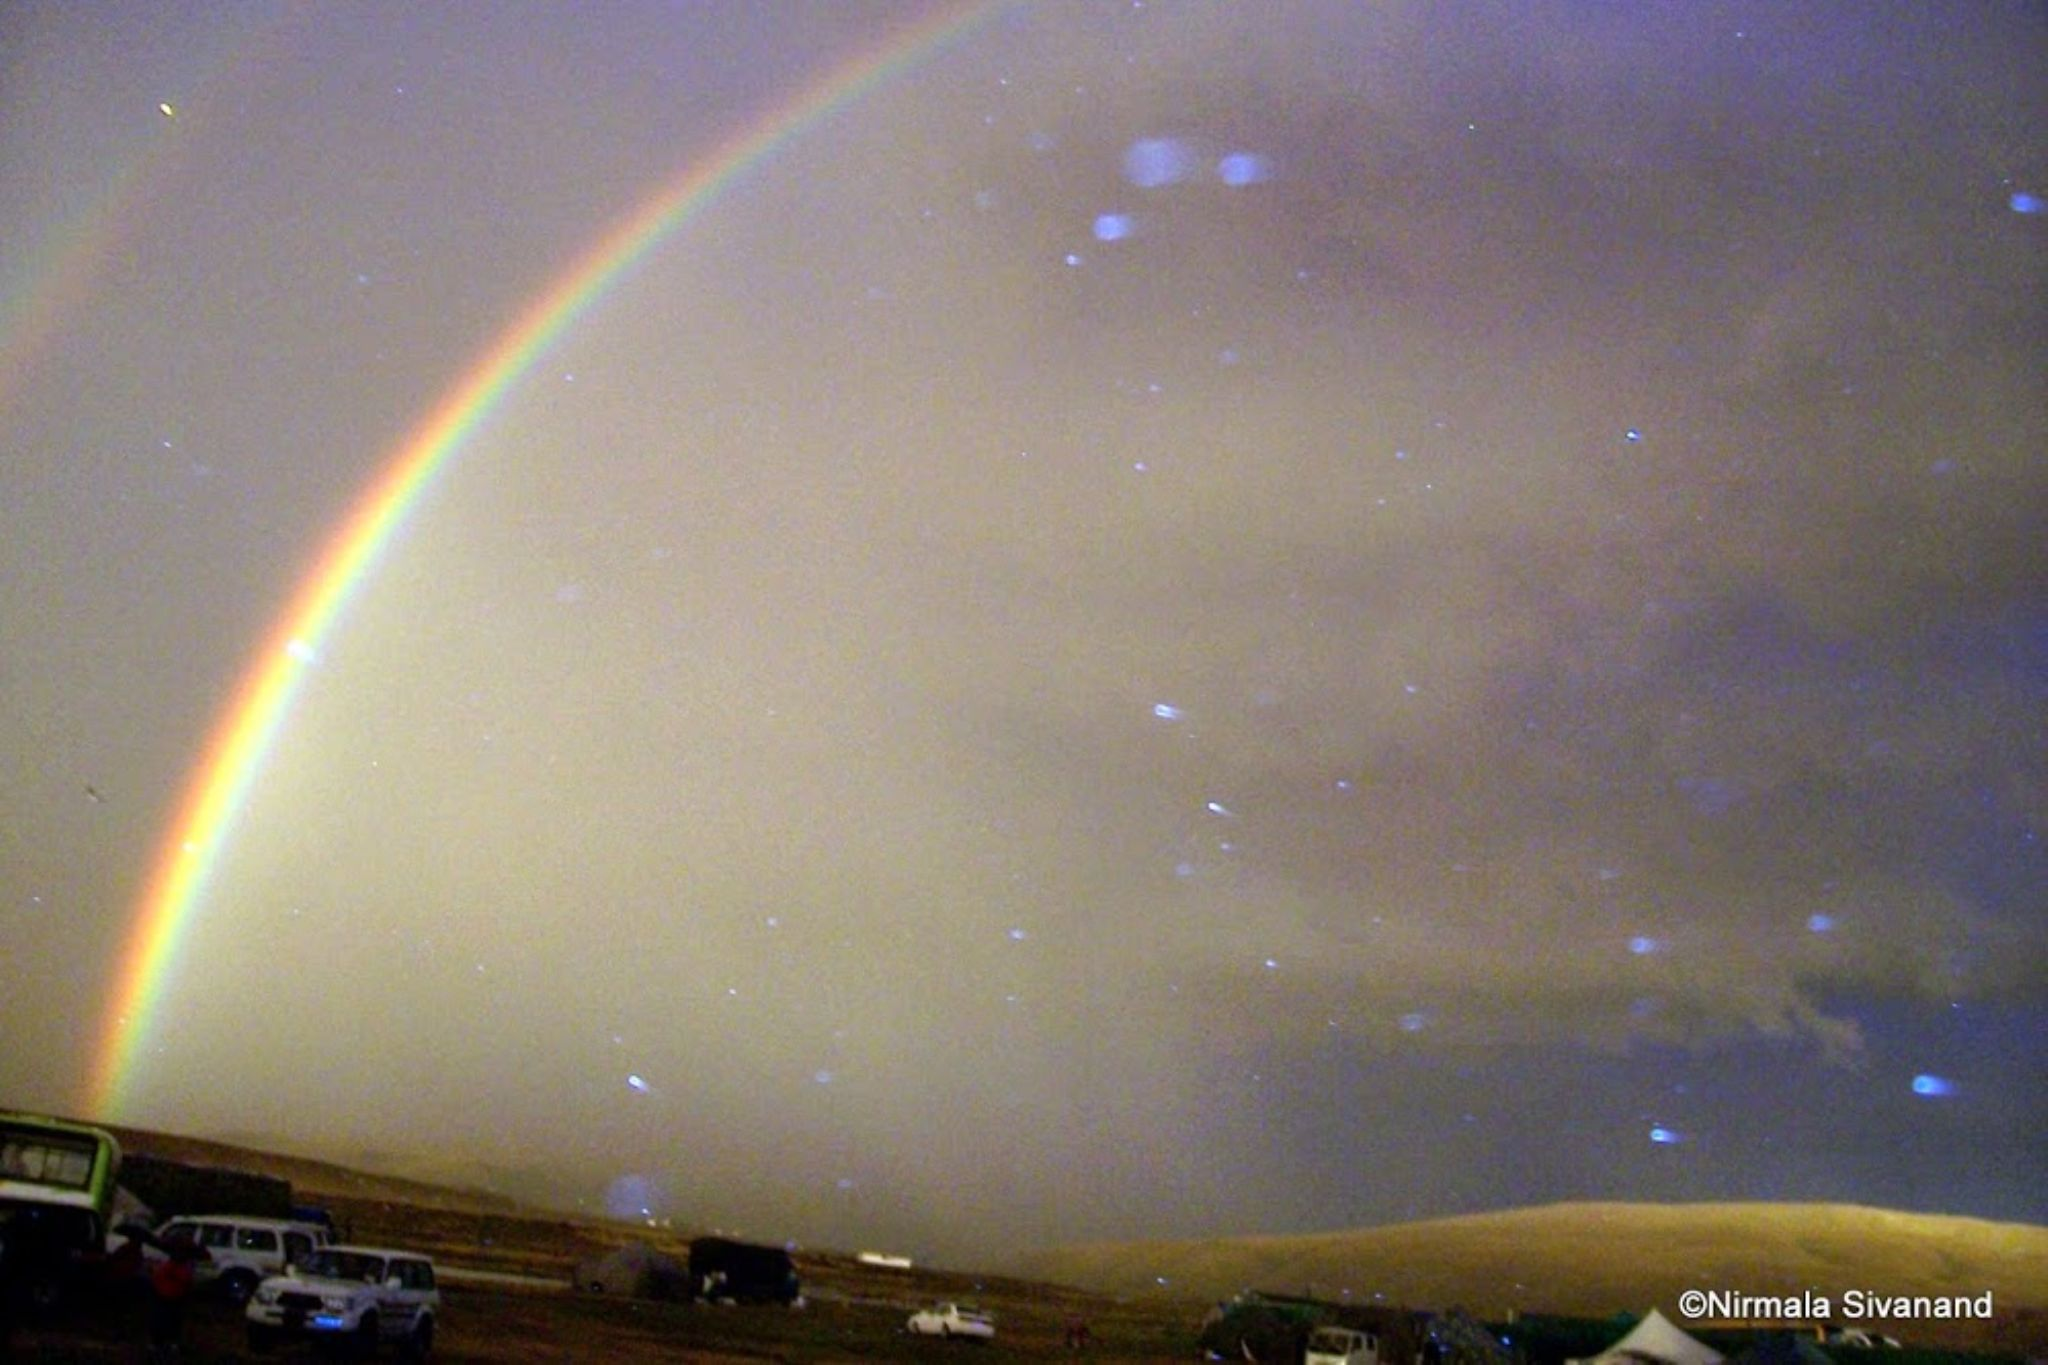 Rainbow at Manasarover by Nirmala Sivanand